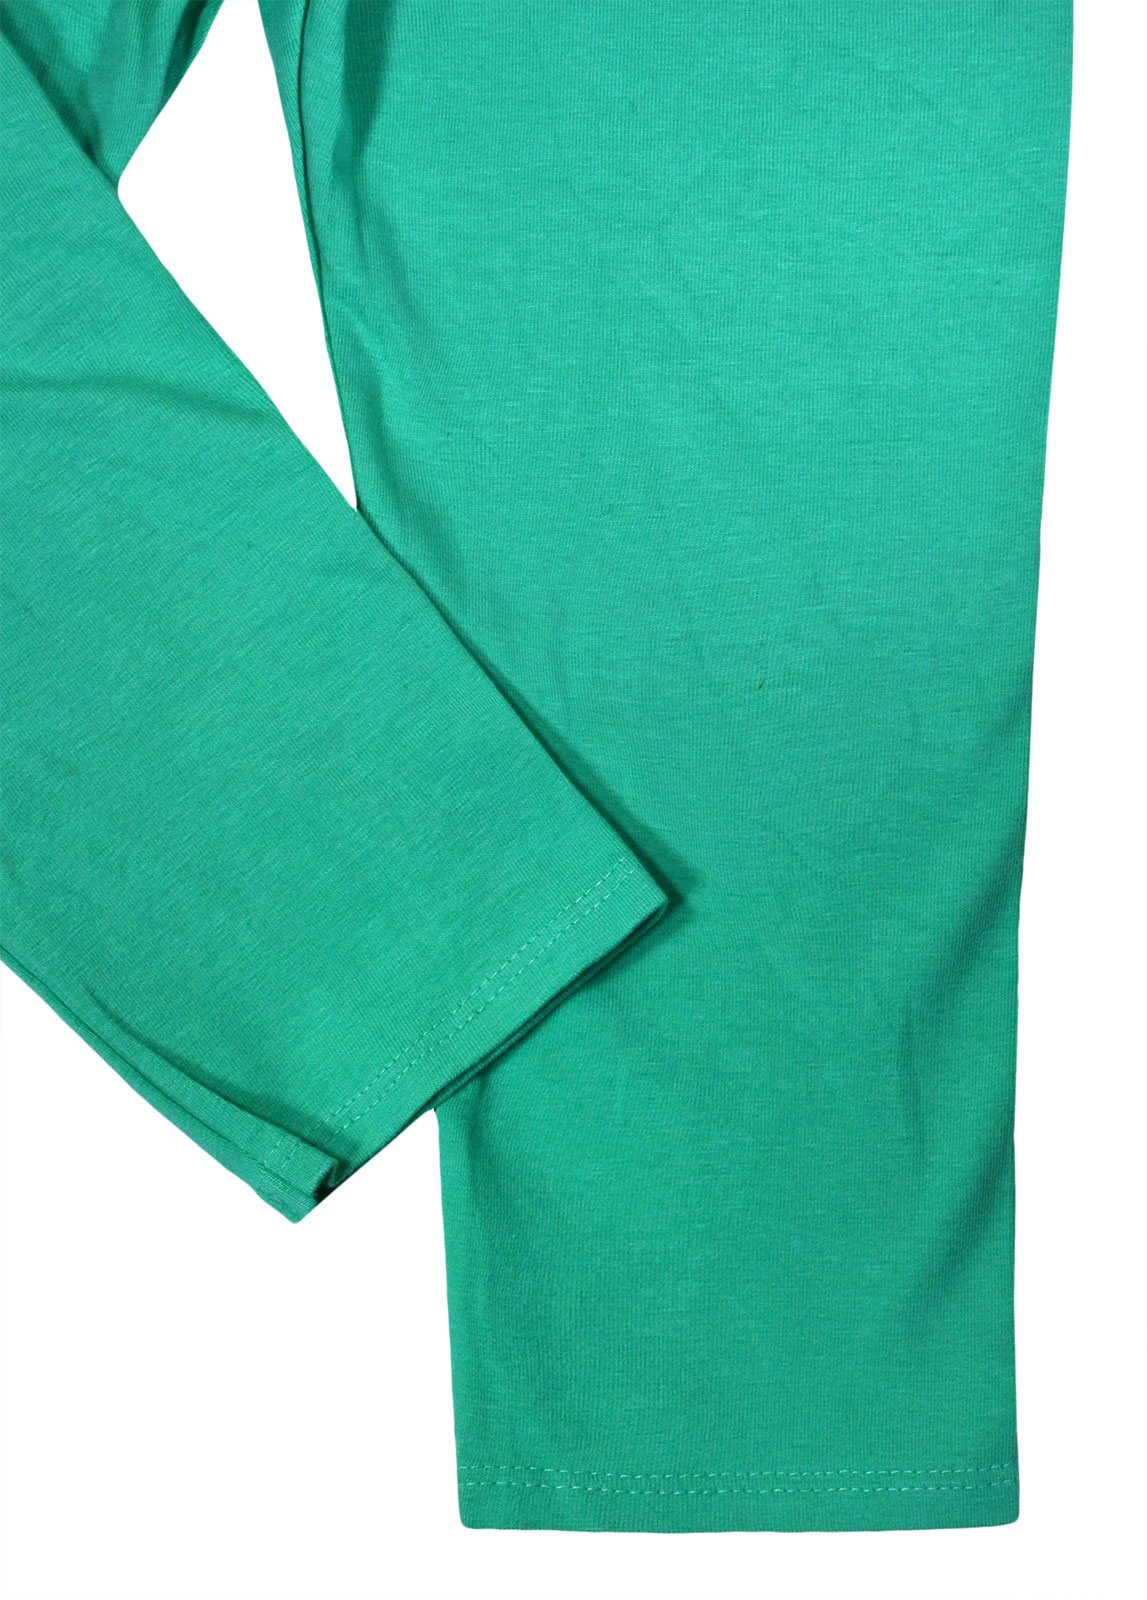 Girls-Next-Leggings-Kids-New-Pants-Age-2-3-4-5-6-7-8-9-10-11-12-13-14-15-16-Yrs thumbnail 29